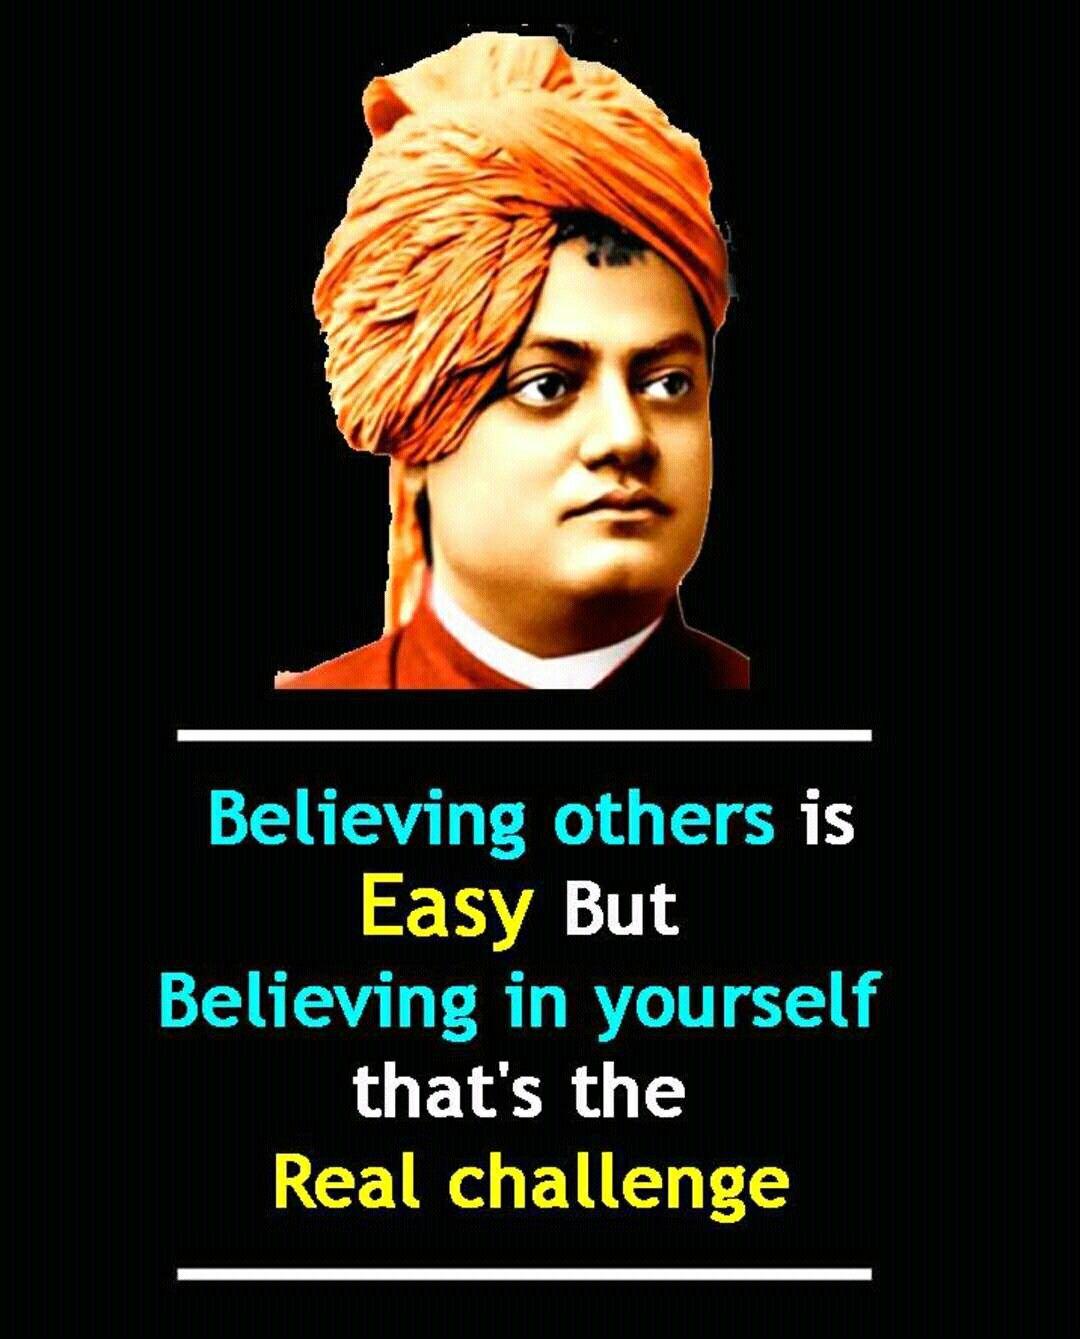 Life Quotes, Swami Vivekananda